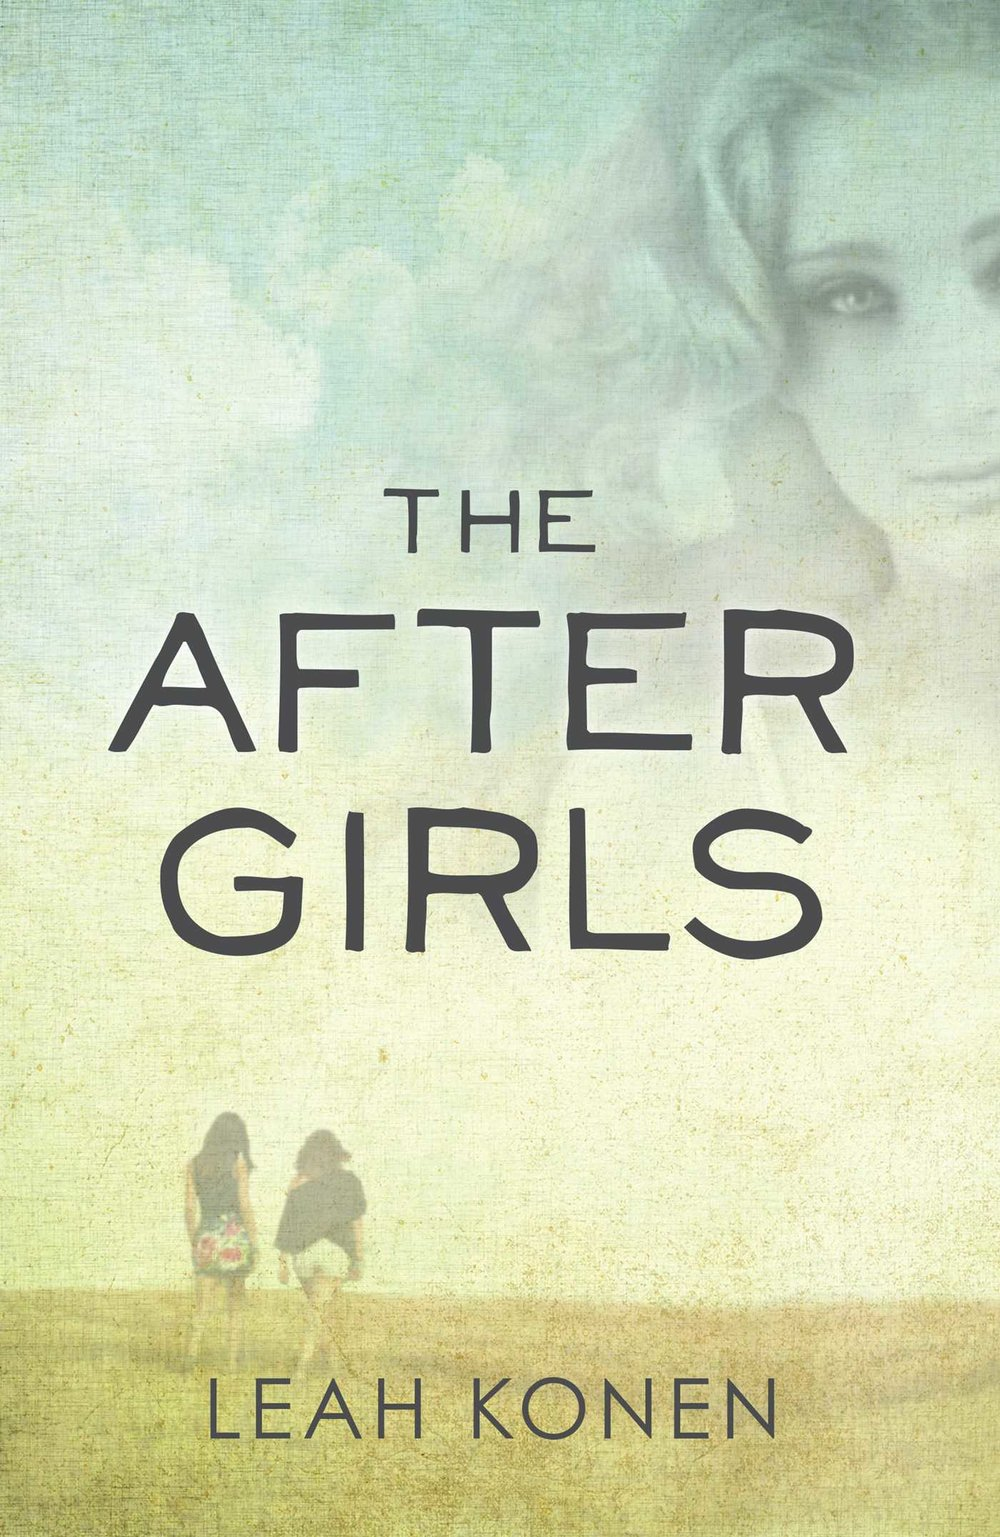 the-after-girls-9781440561085_hr.jpg